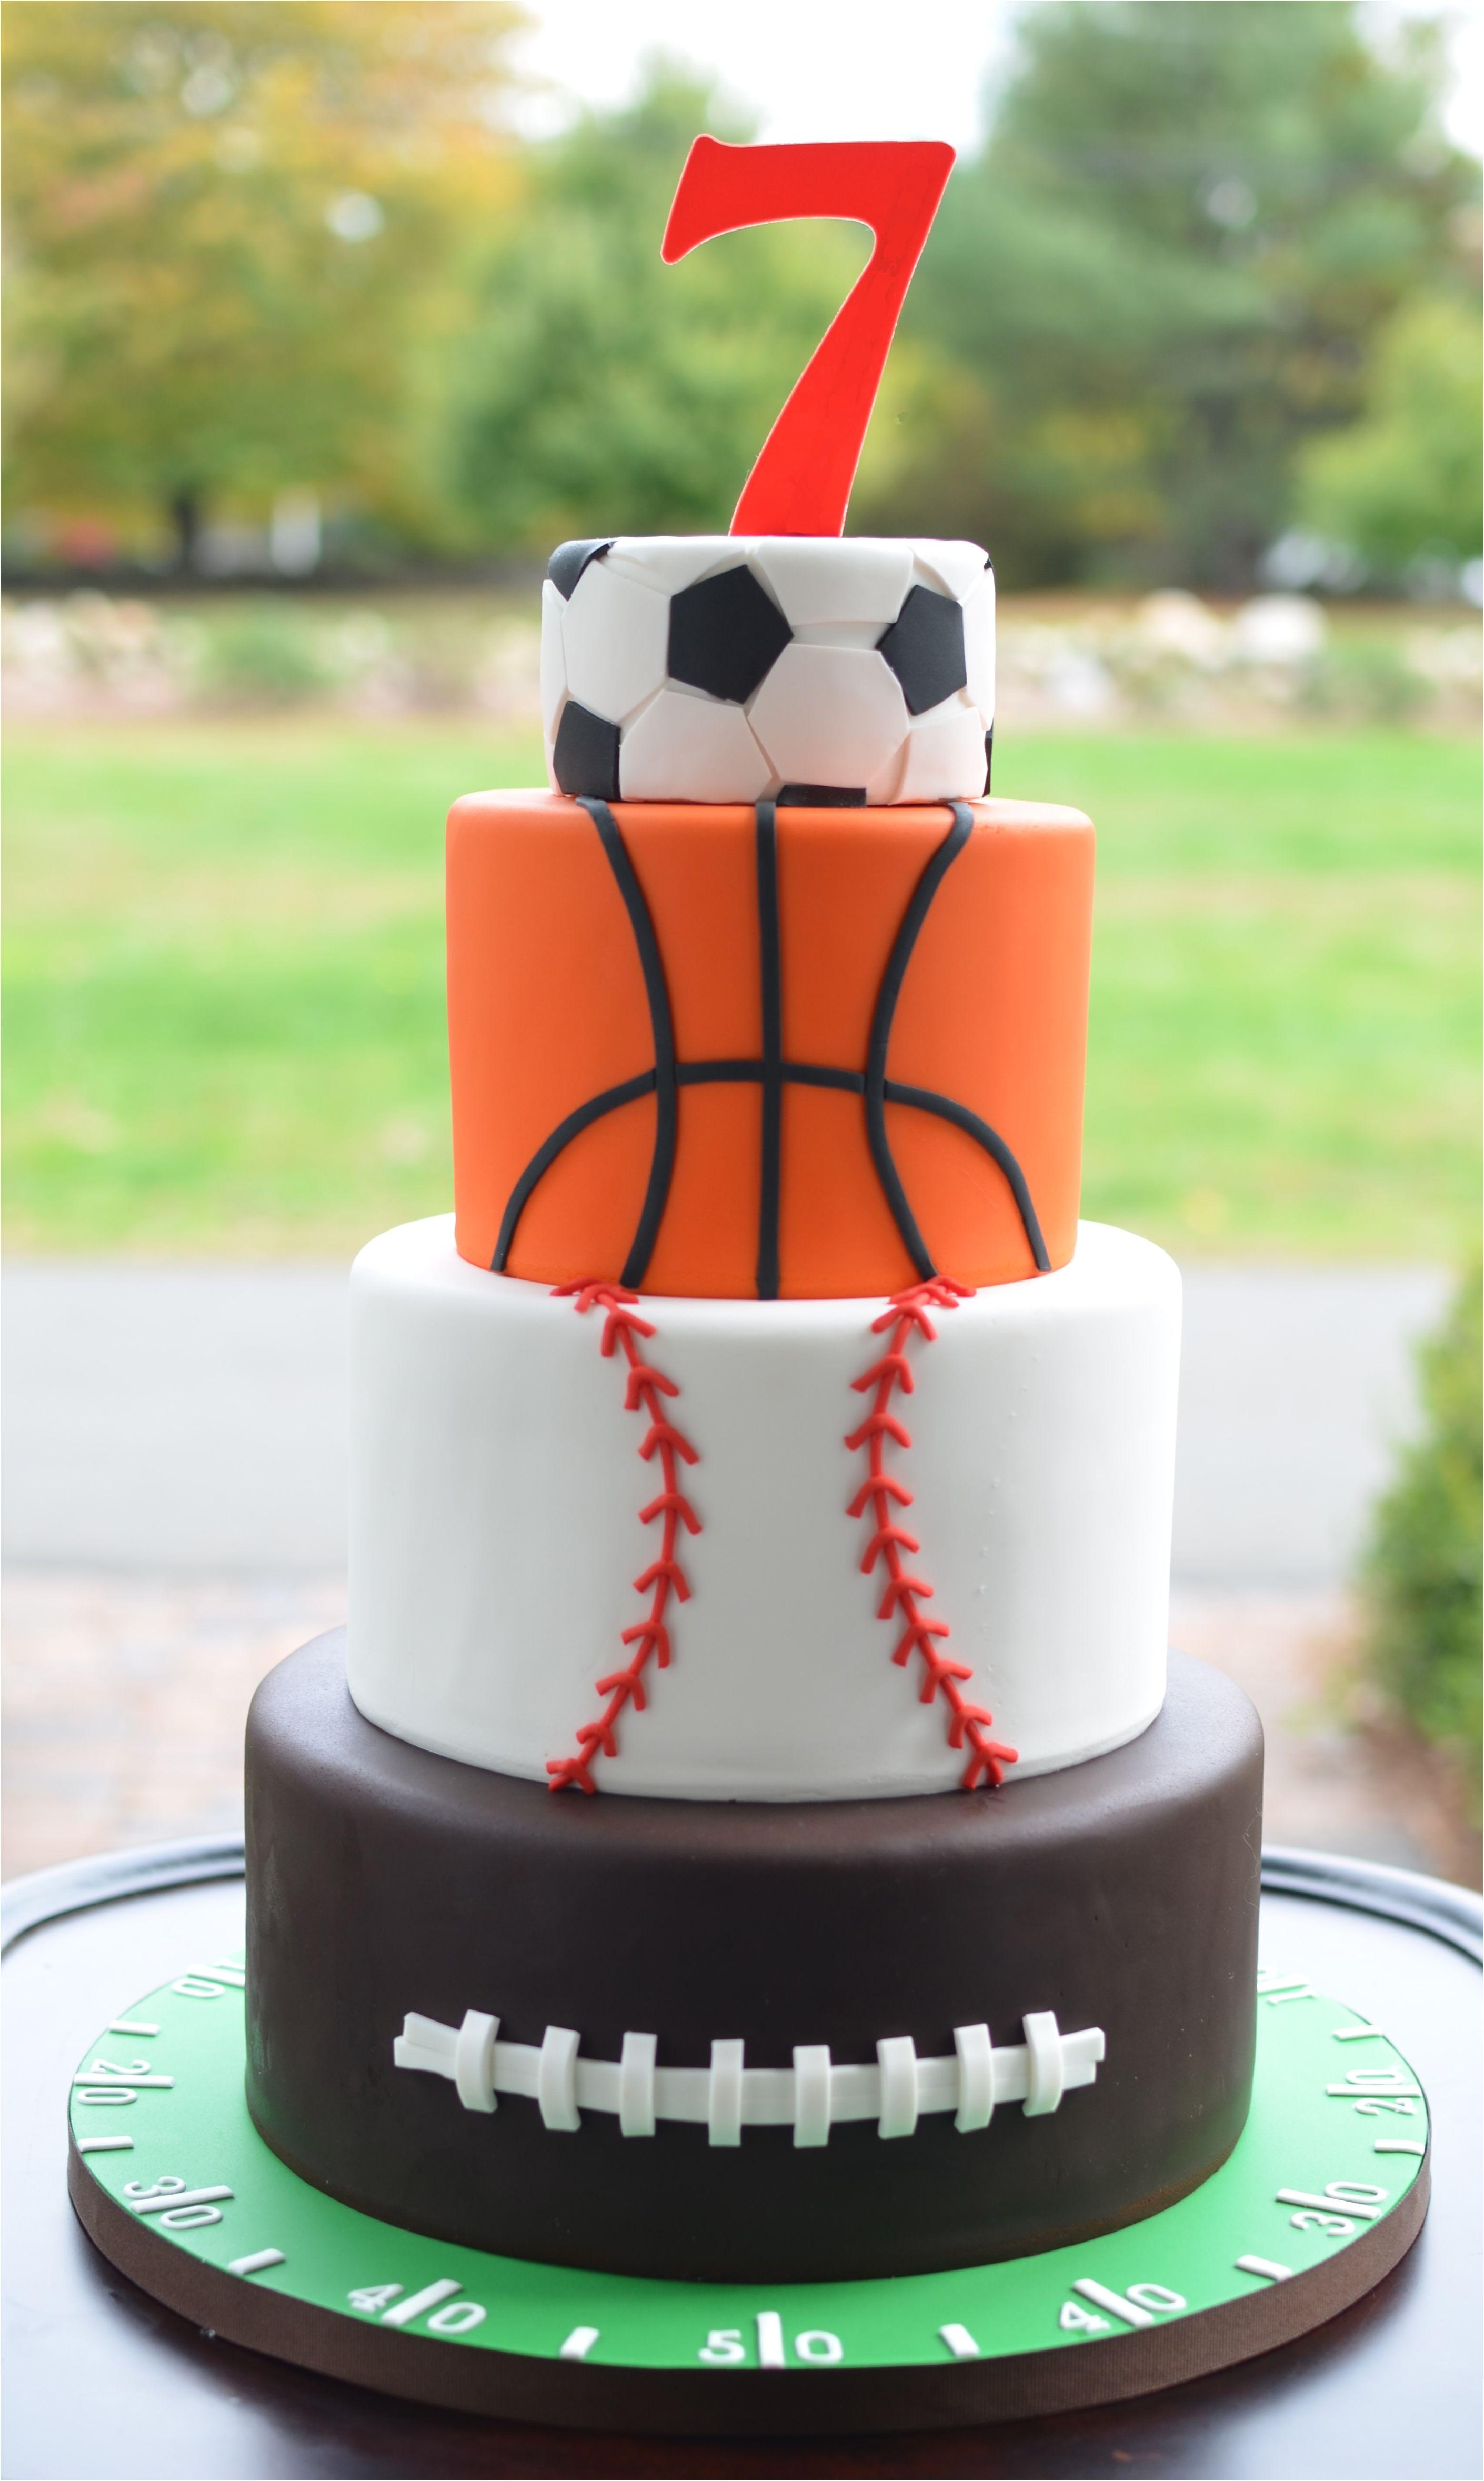 Sugar Baseball Cake Decorations All Star Sports themed Birthday Cake but A Dream Custom Cakes